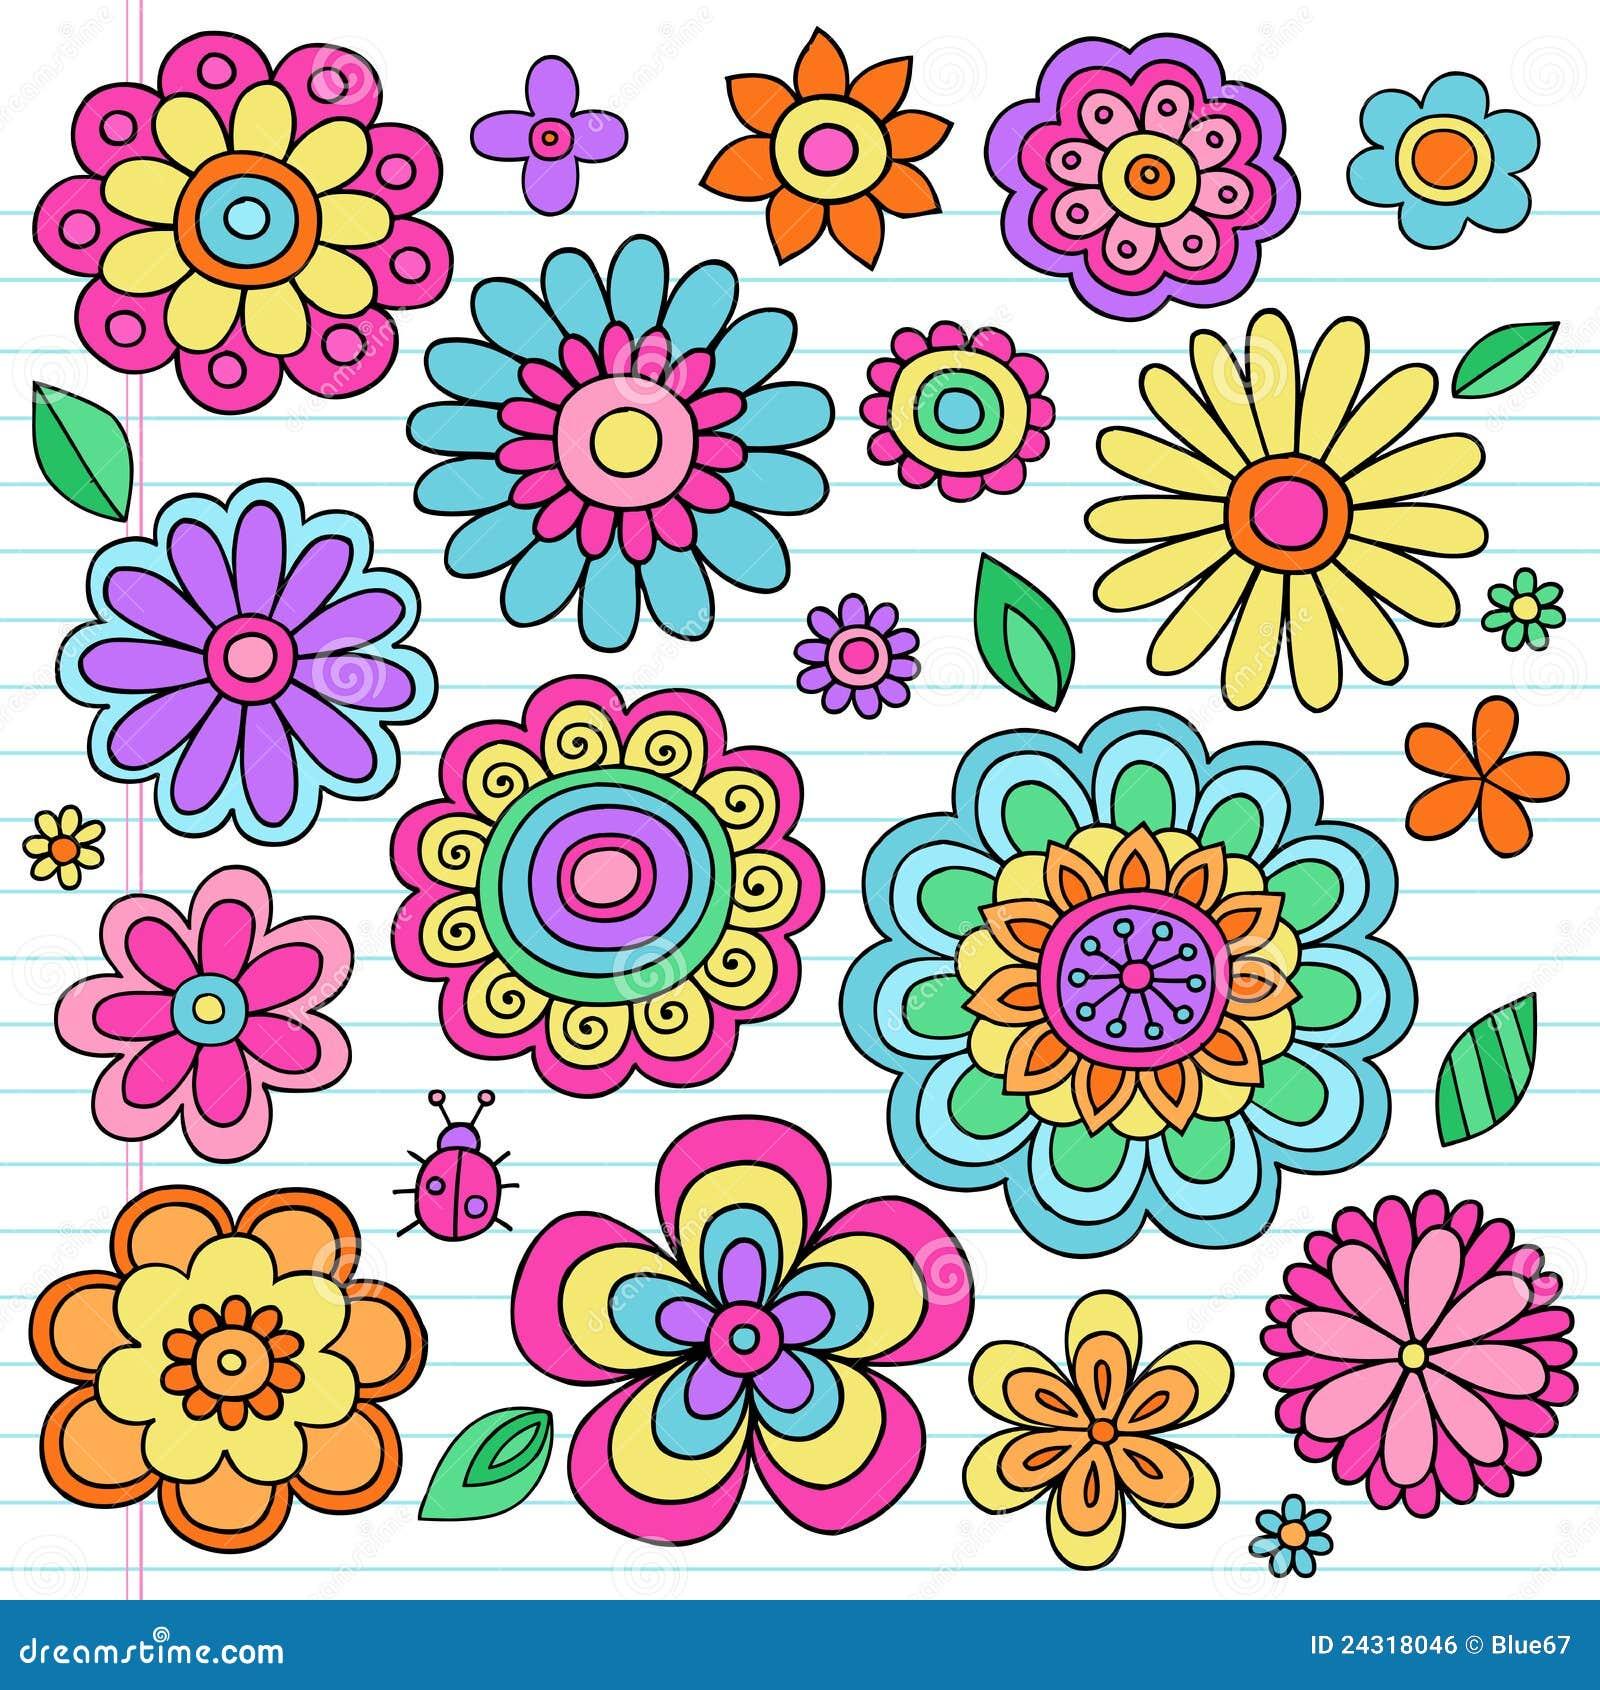 Psychedelic Flower Power Doodles Vector Set